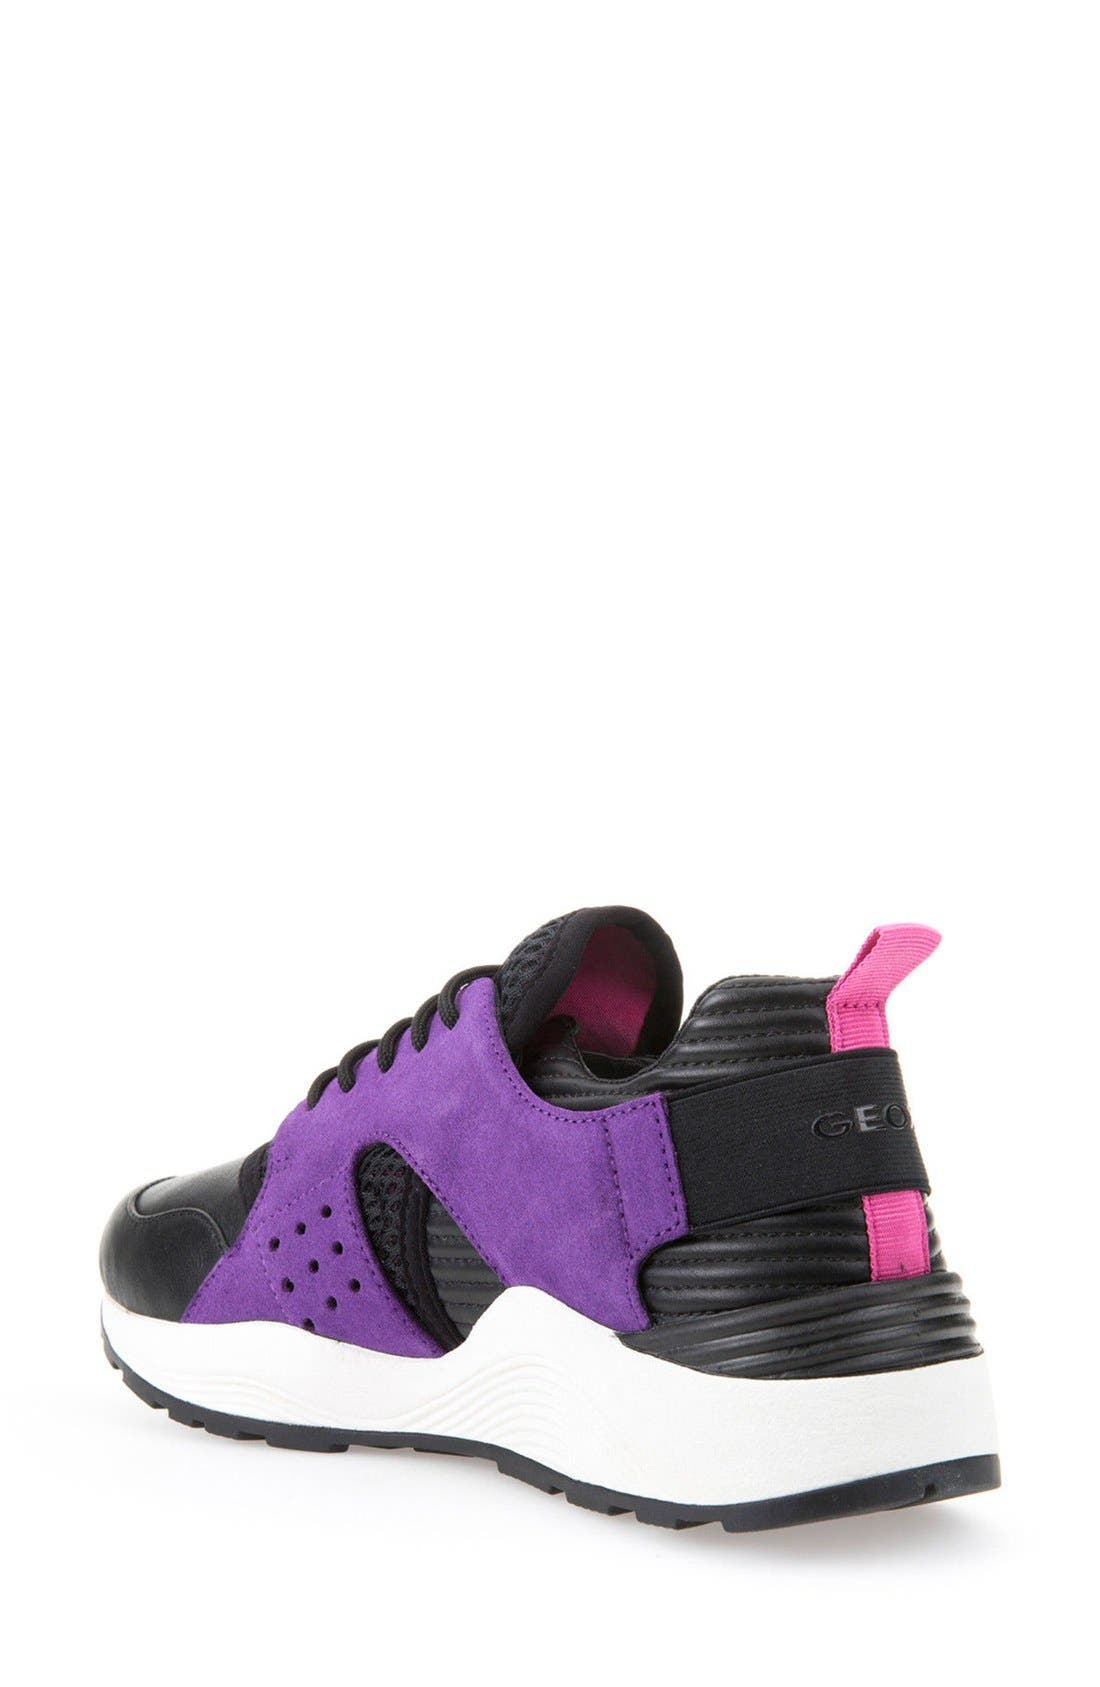 Alternate Image 2  - Geox 'Omaya' Sneaker (Women)